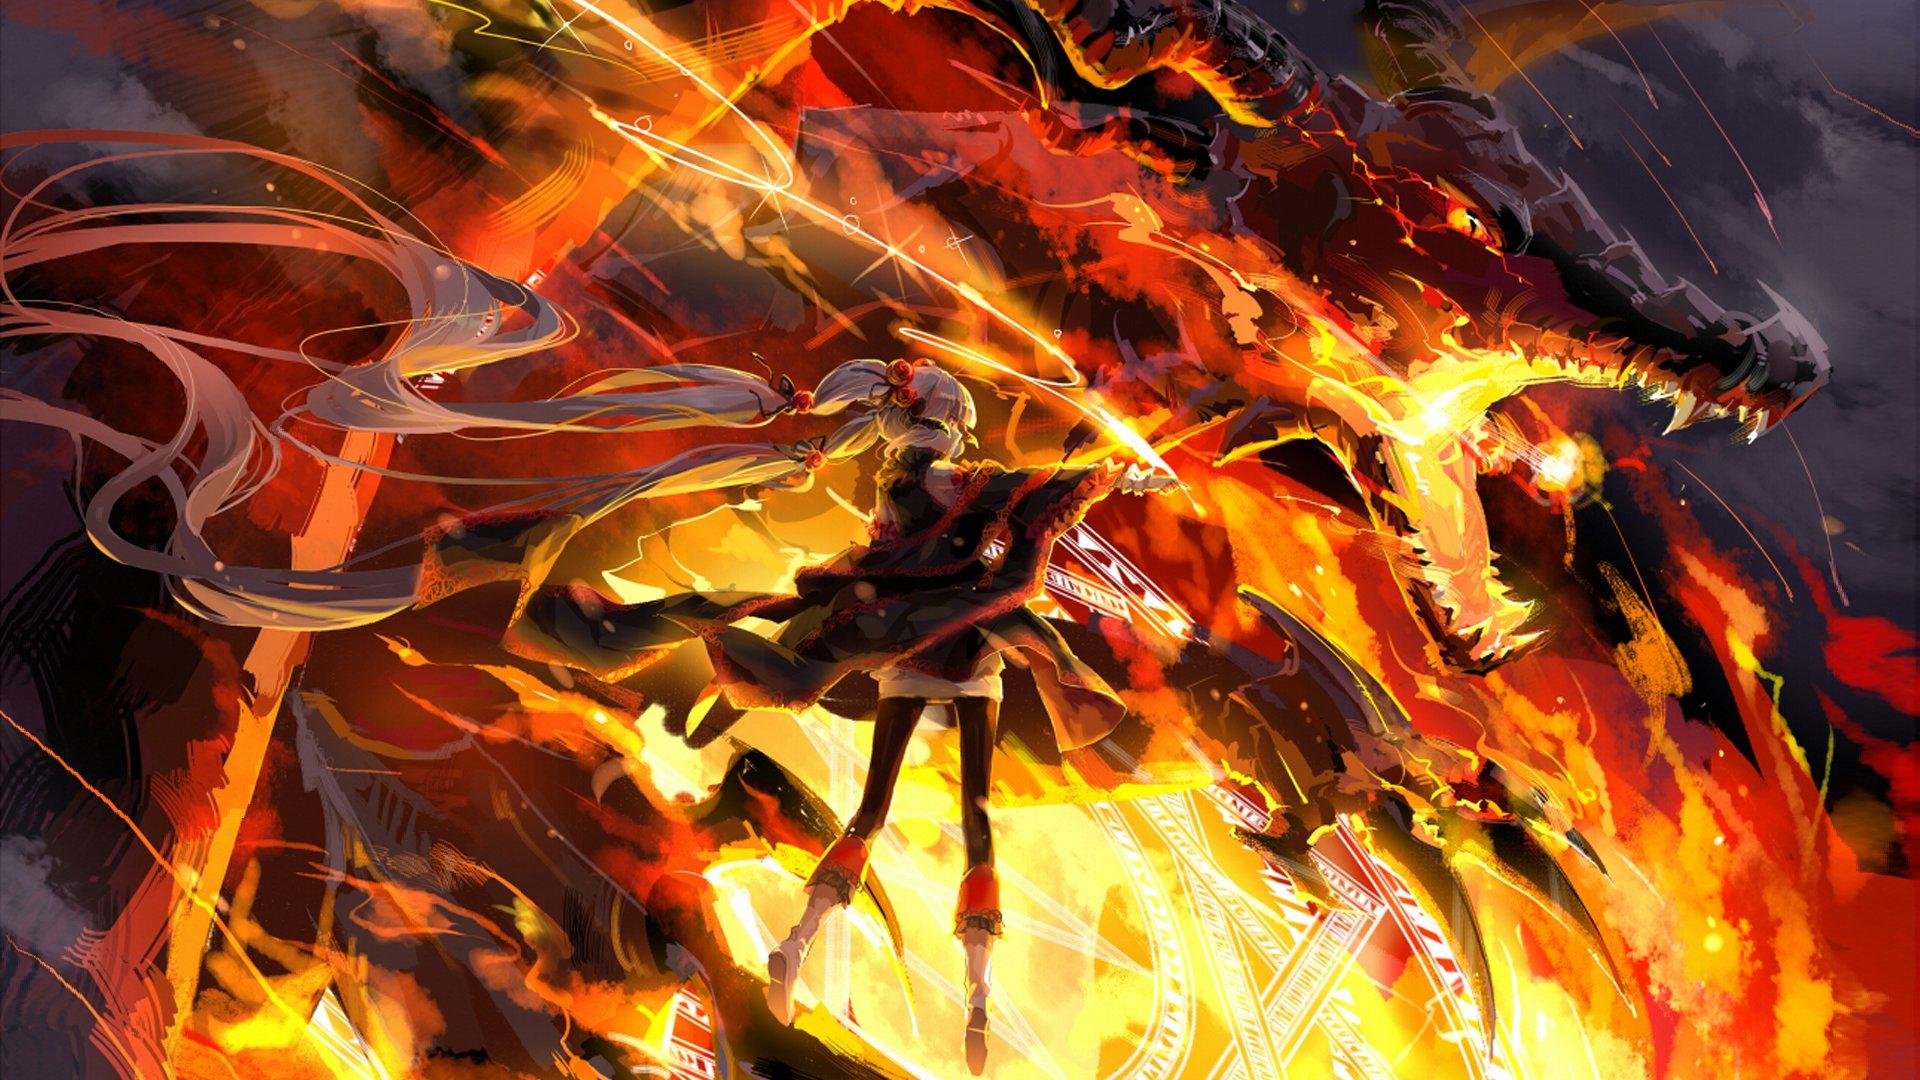 Anime - Unknown  Original (Anime) Warrior Wallpaper